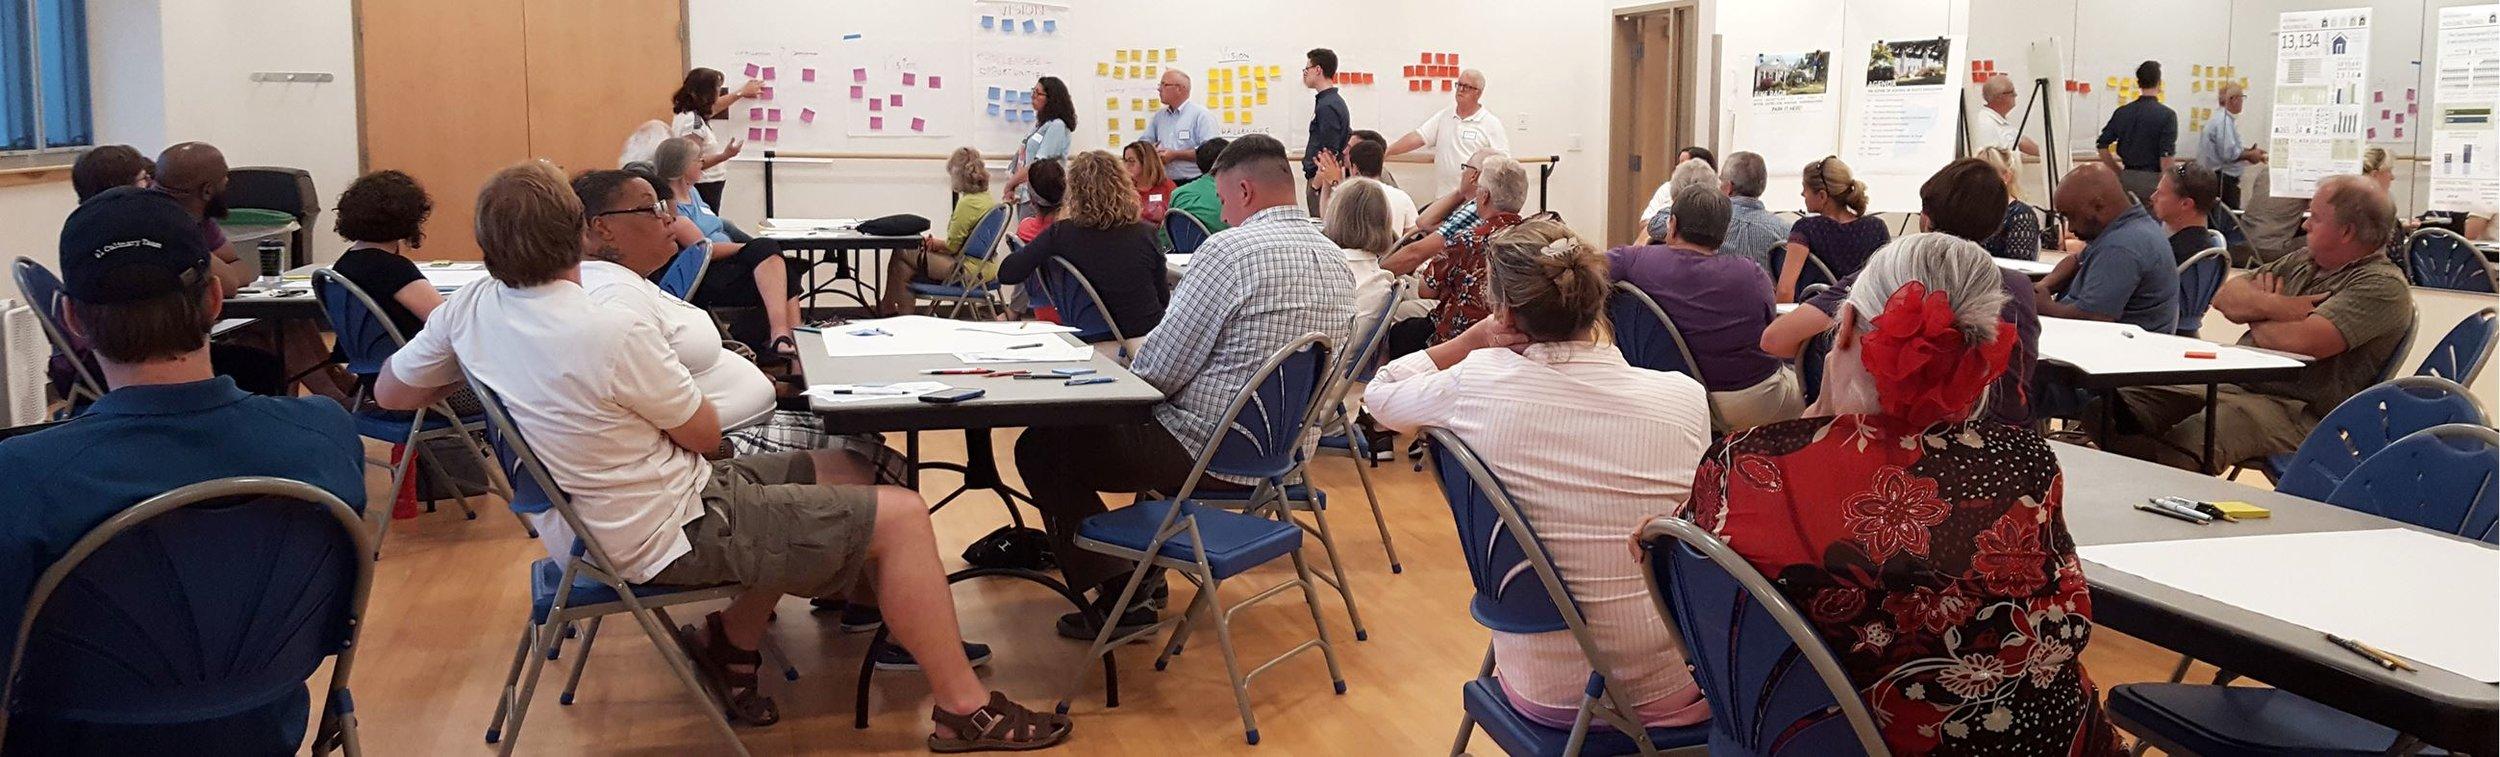 Planning Public Meeting.jpg